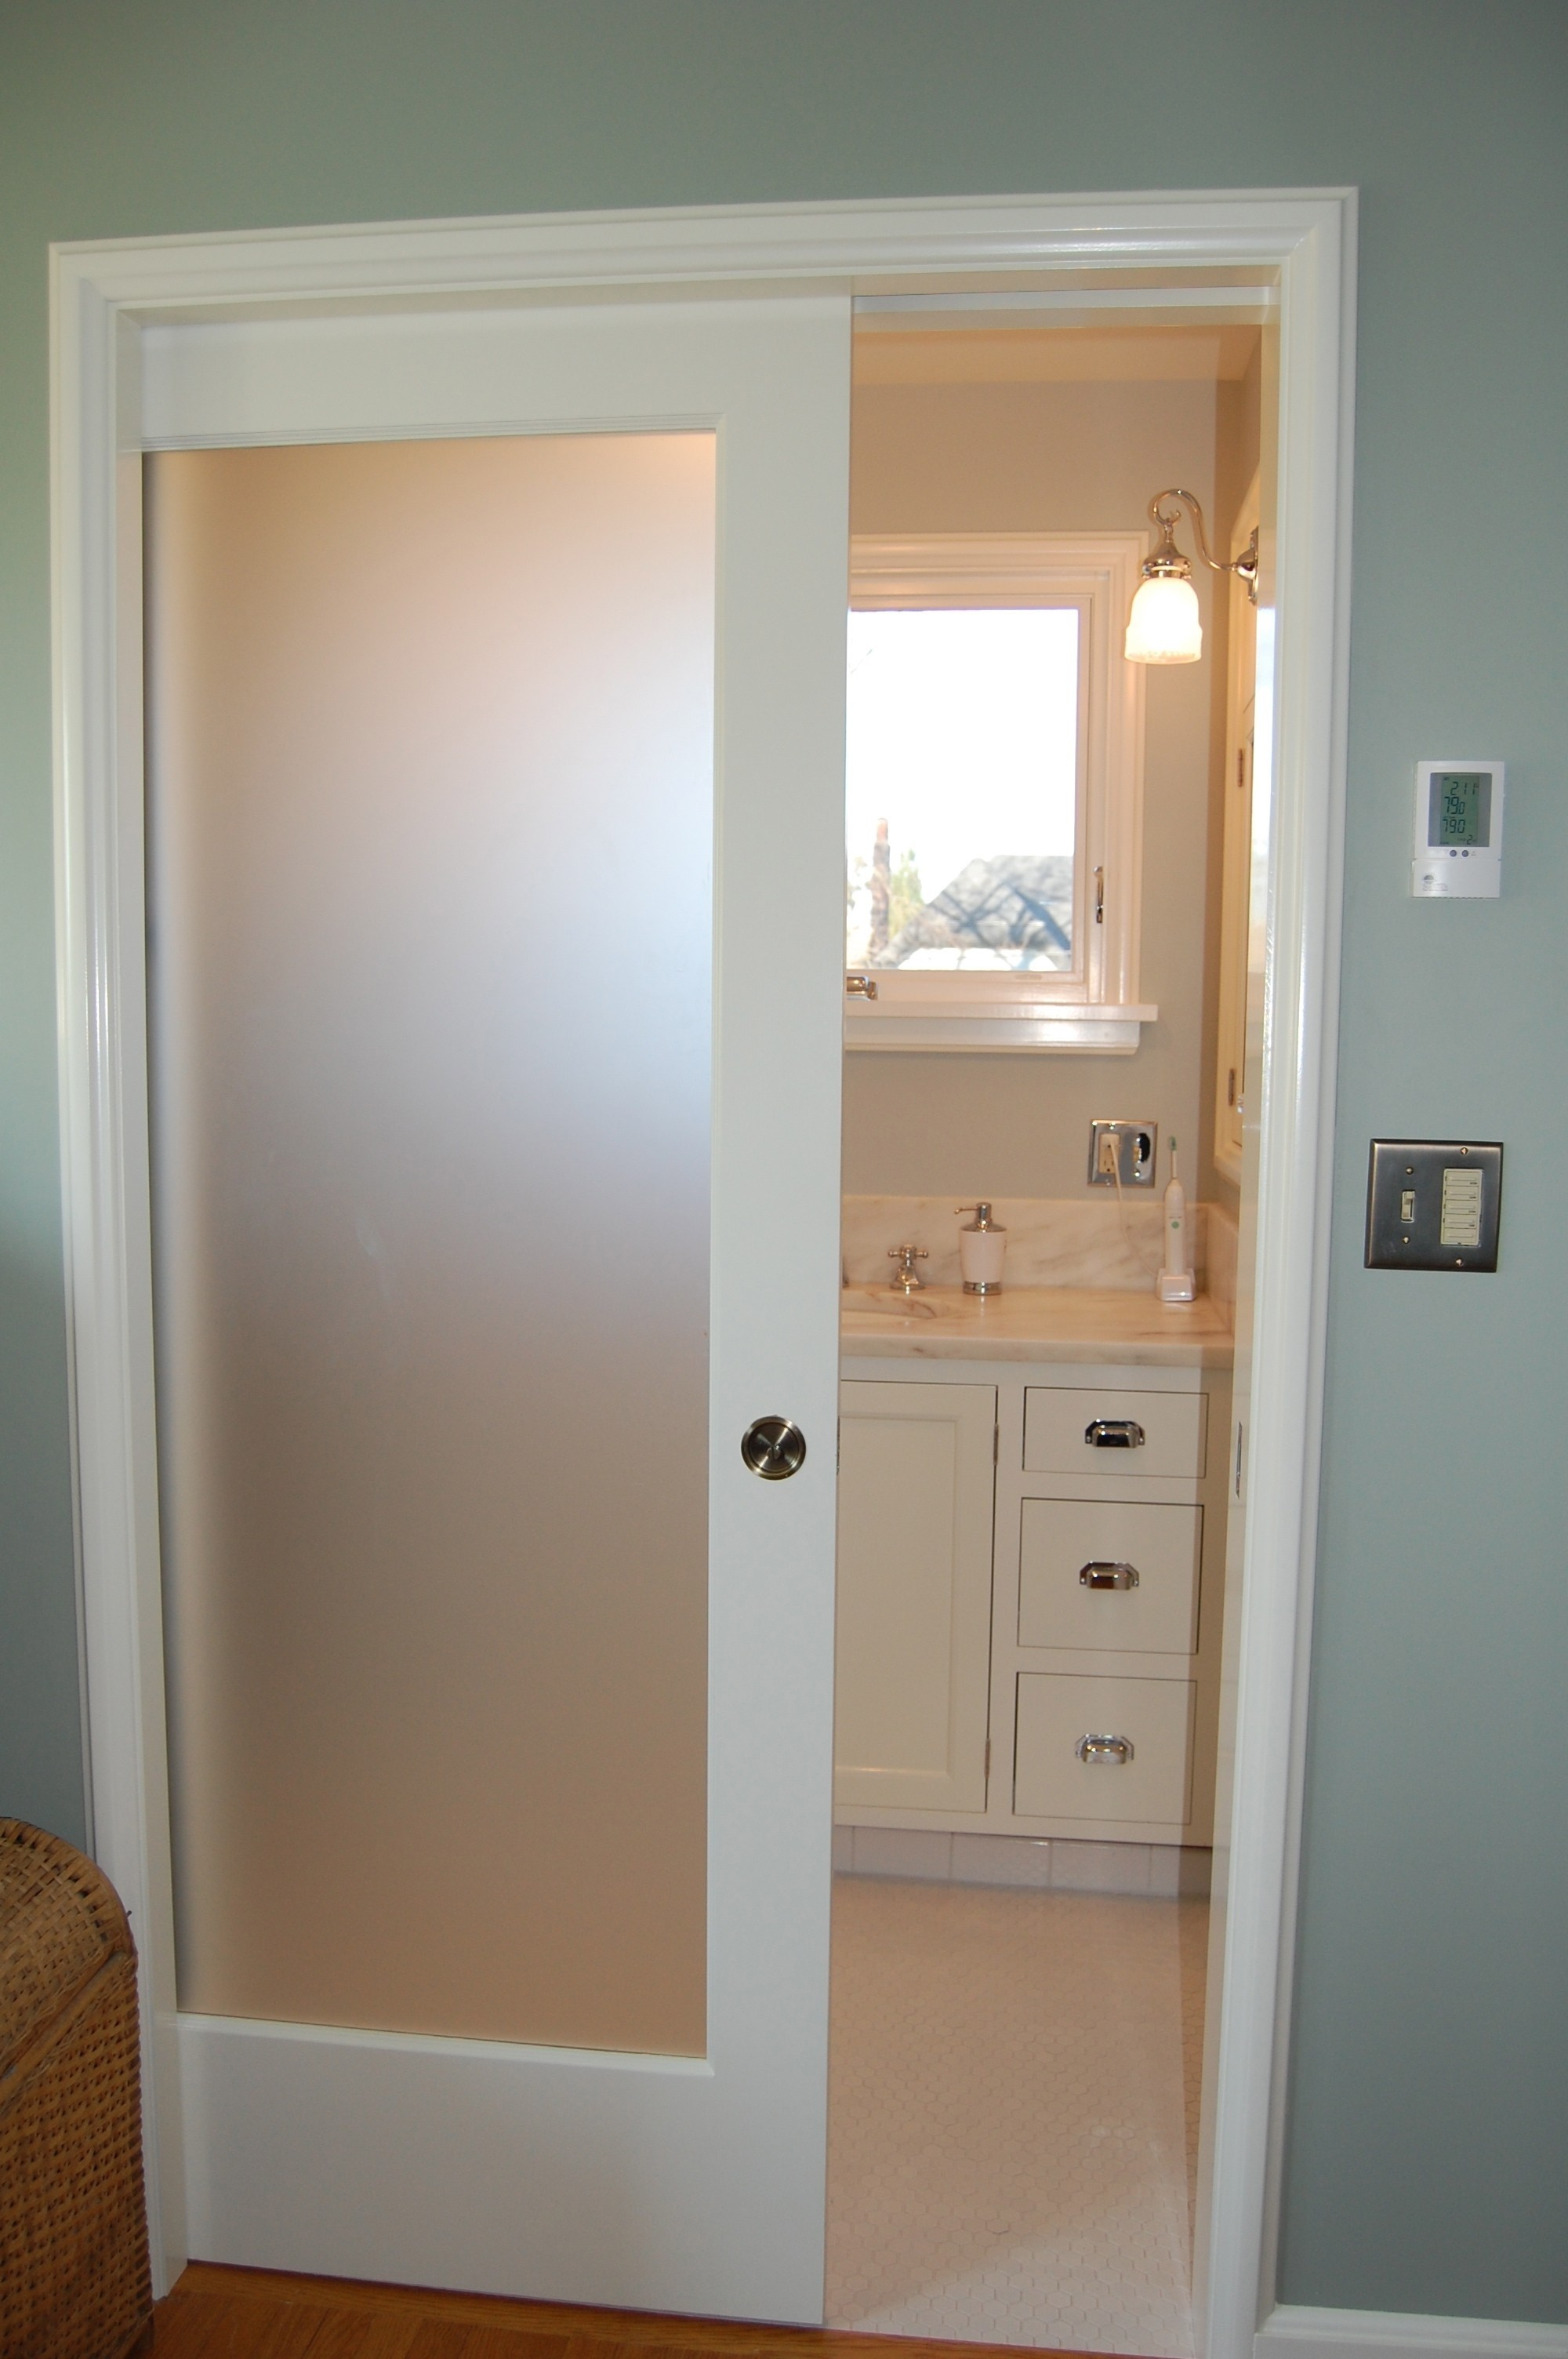 Sliding Bathroom Door Luxury Bathroom Nice Sliding Bathroom Doors with Door Into Wall Ideas Construction